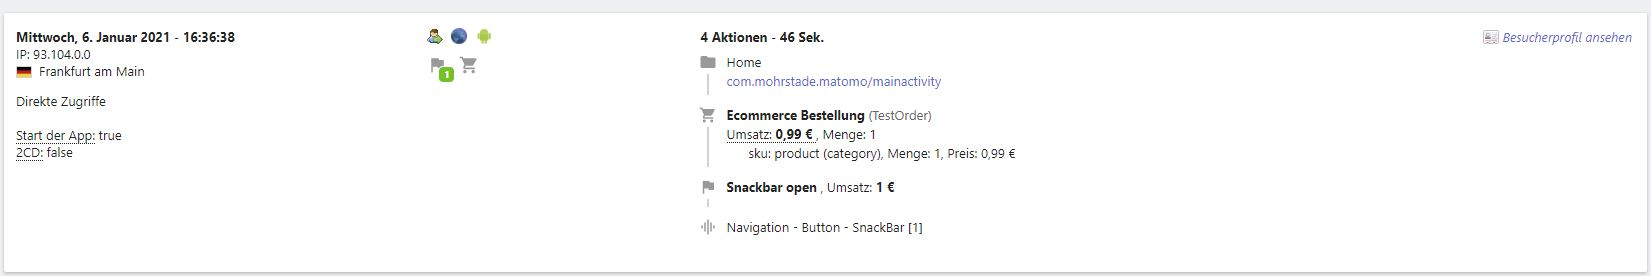 matomo_ecommerce_order_log